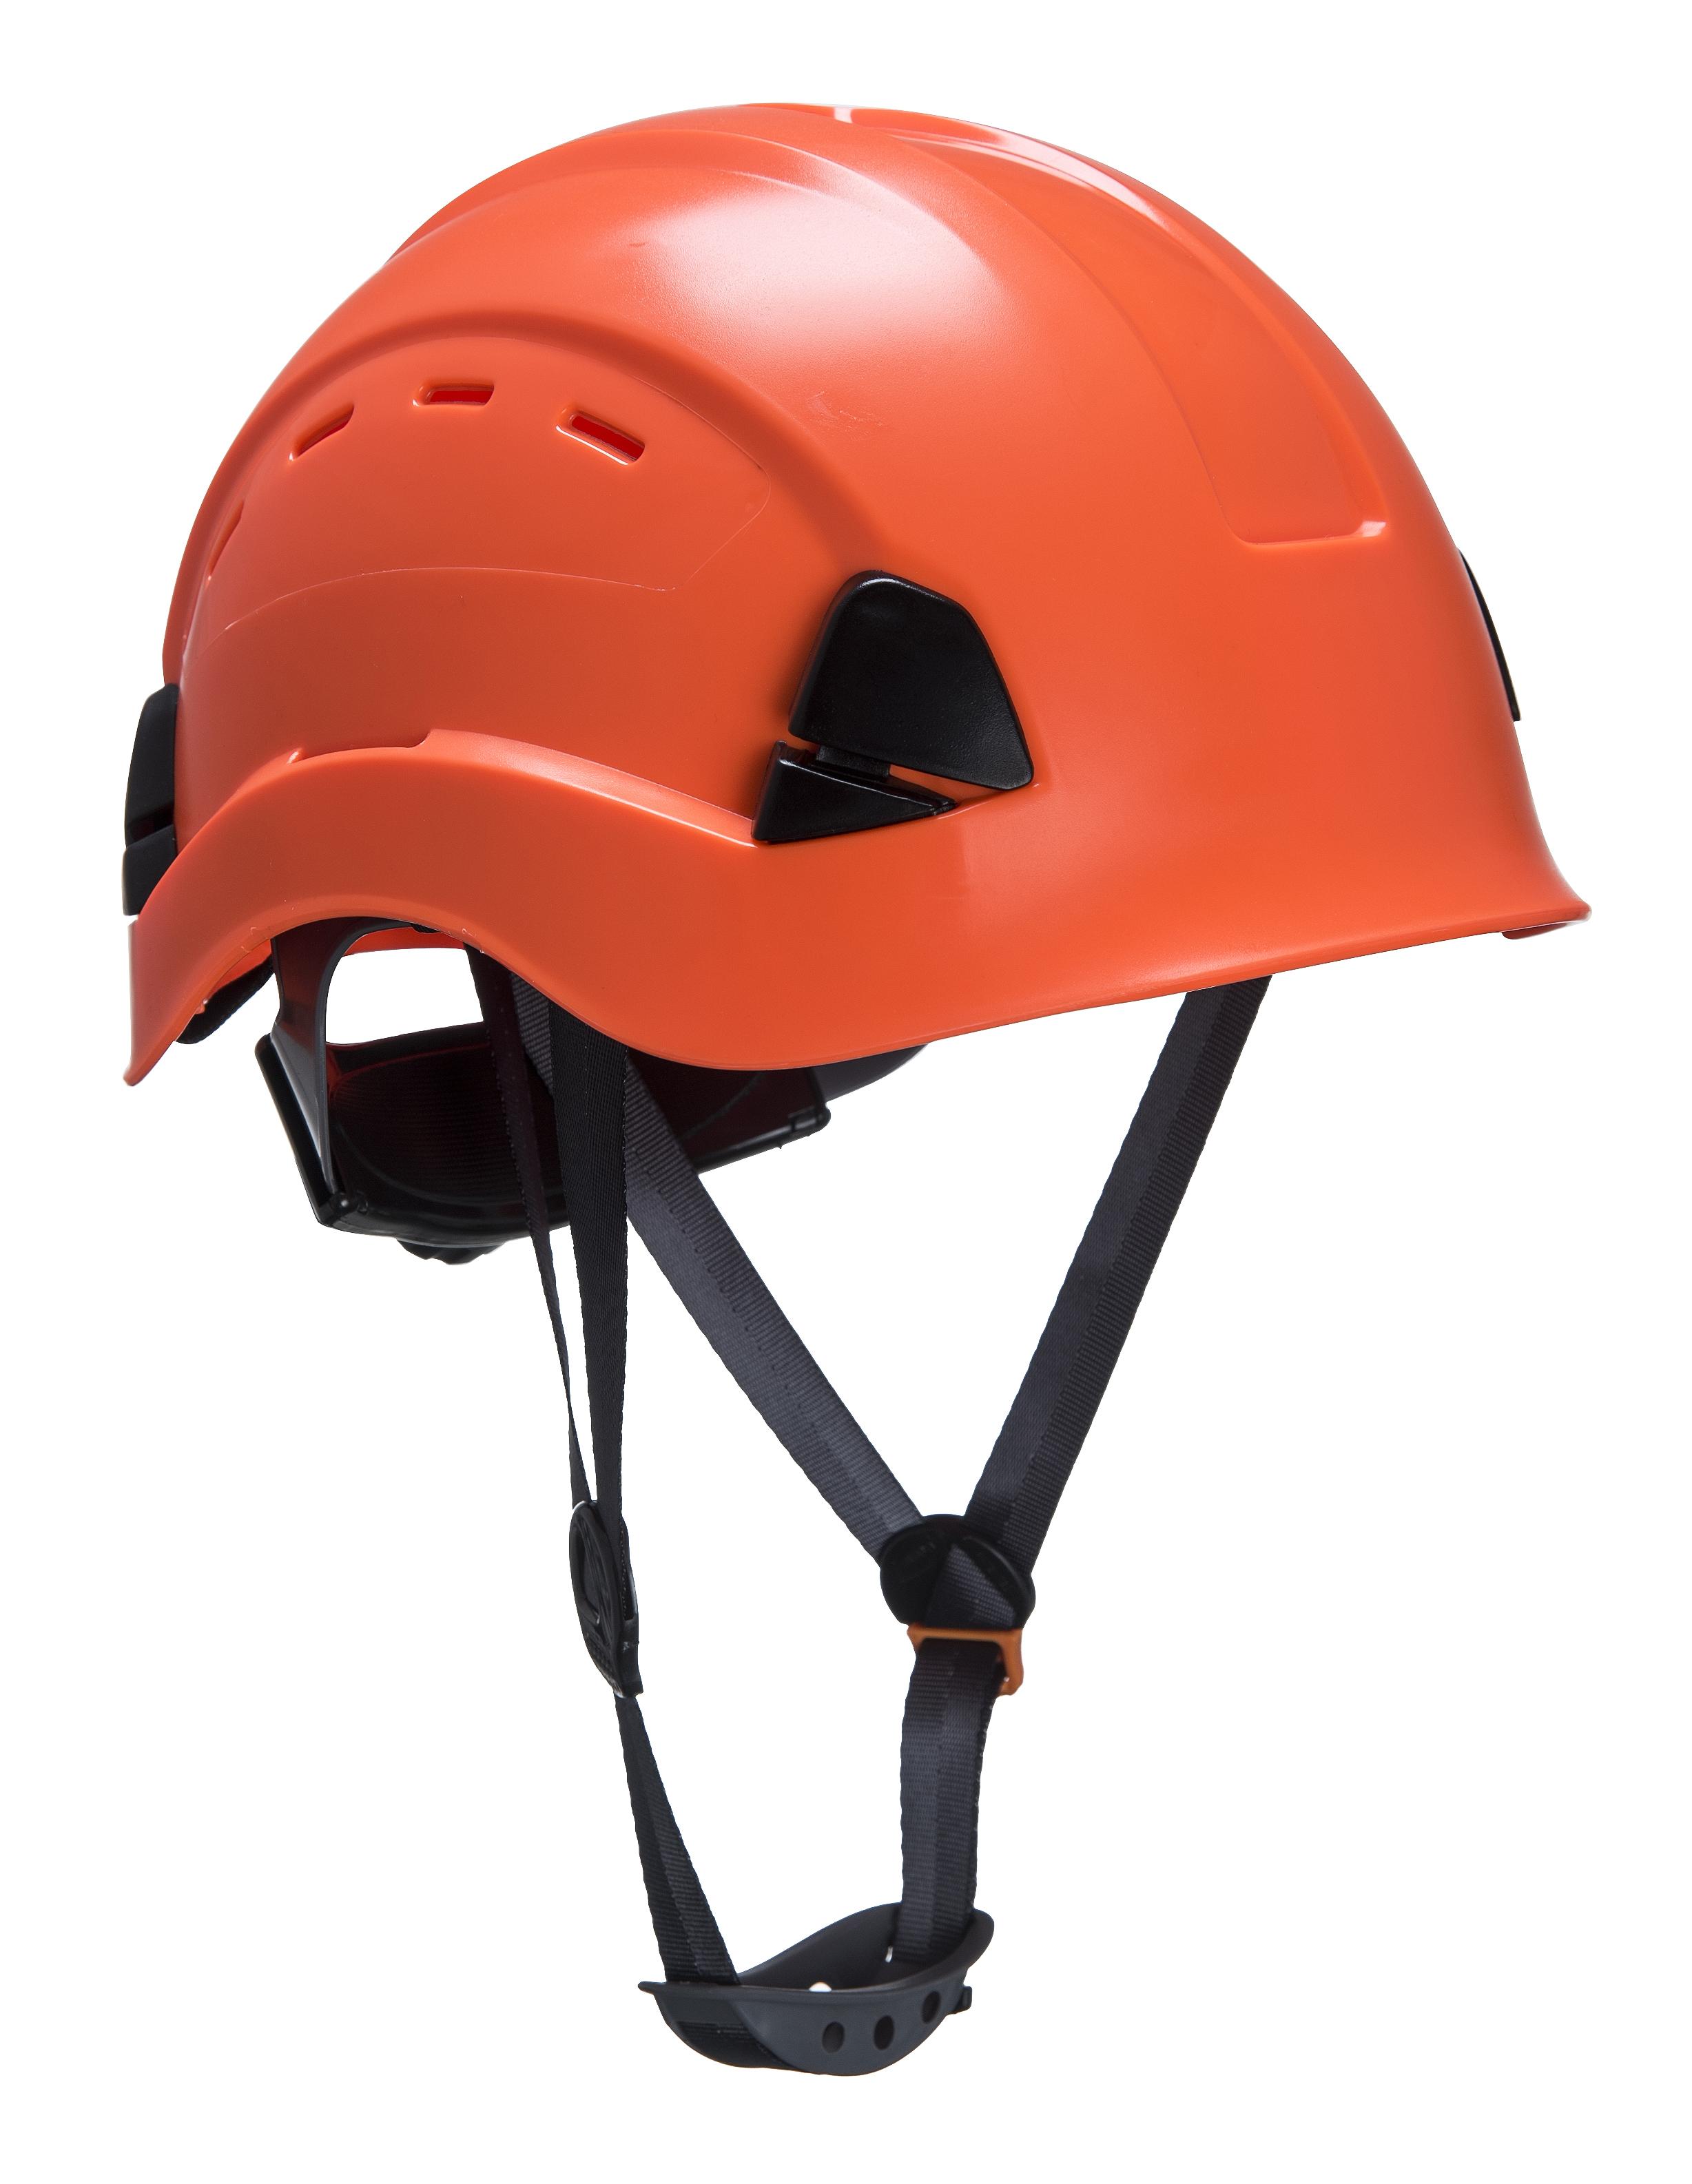 PS63 Portwest Height Endurance Vented Helmet